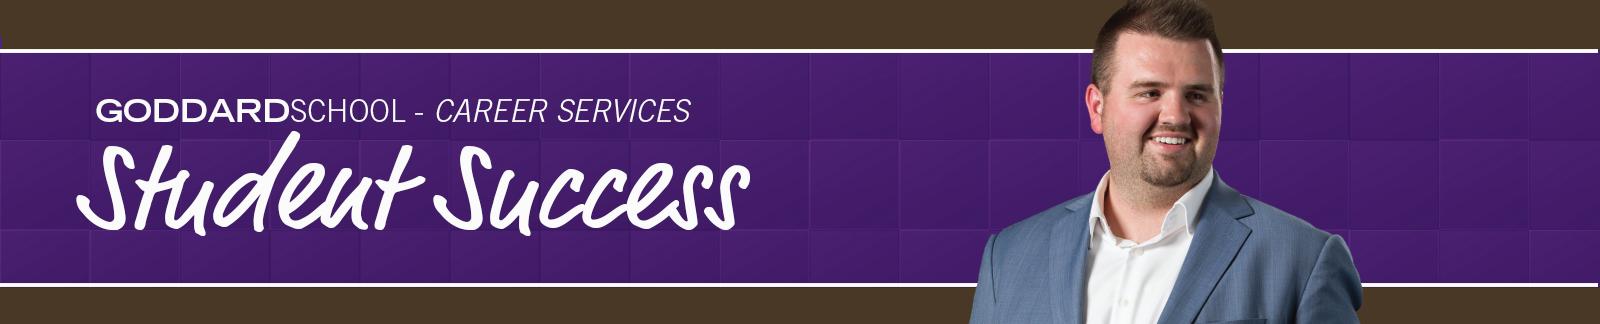 Goddard School: Career Services